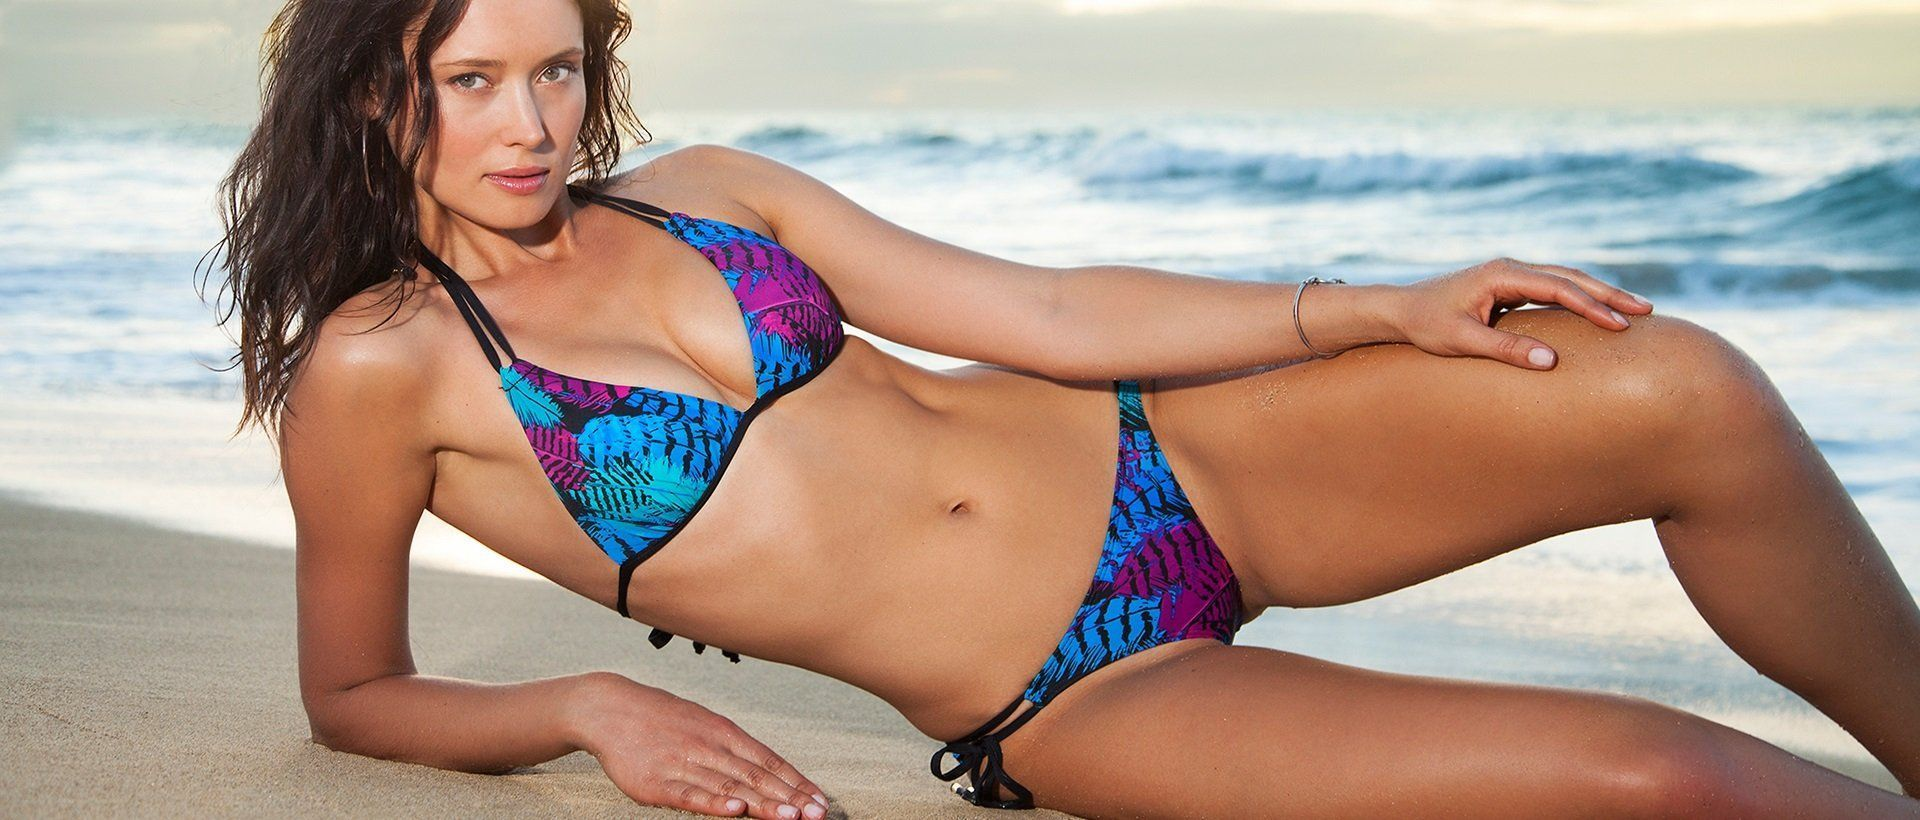 Manhattan reccomend Malibu strings customer bikini contest